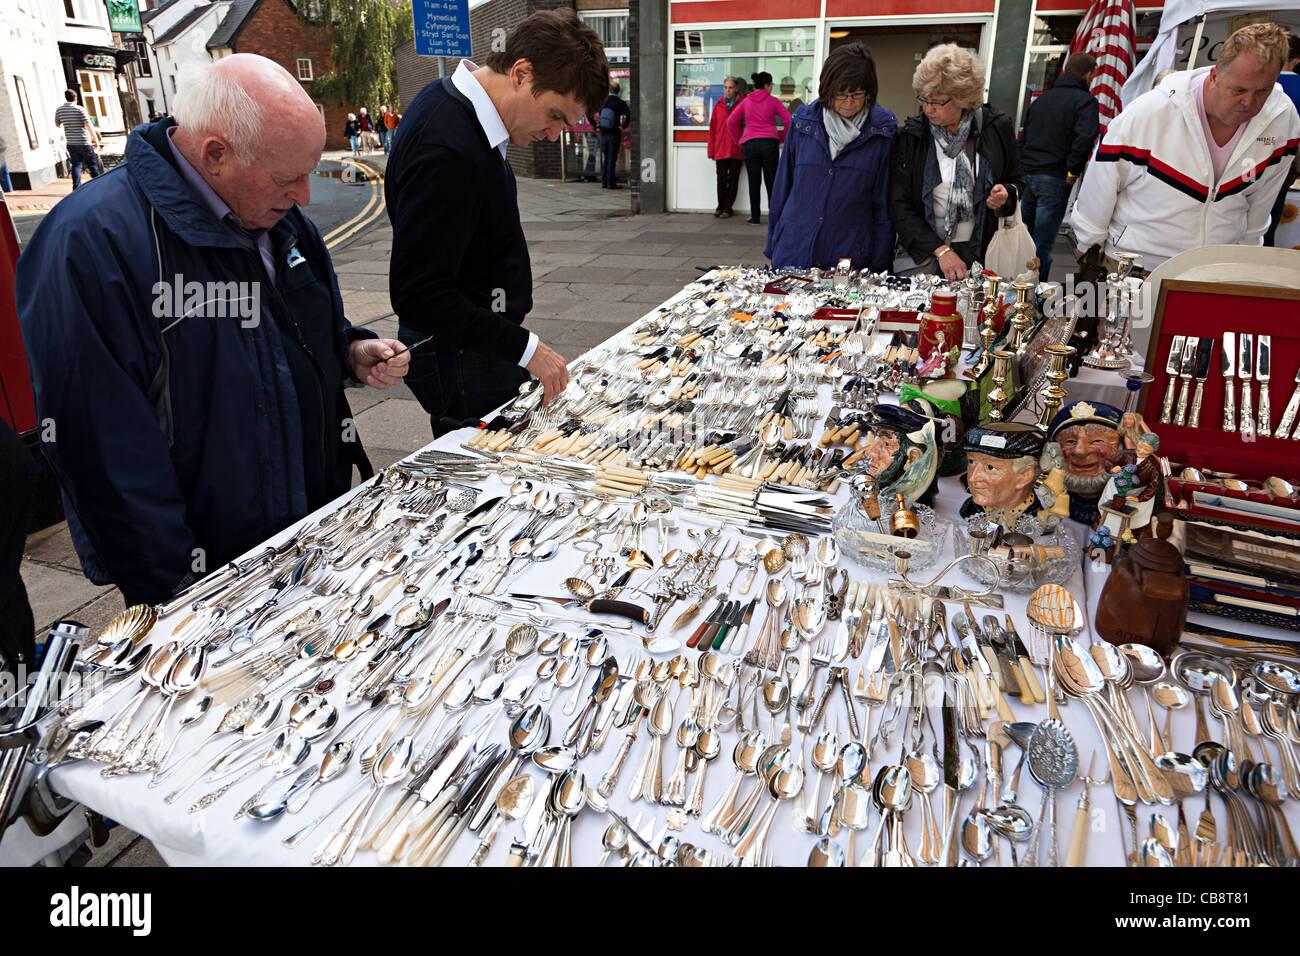 People buying antique bone handled cutlery on sale at market stall Abergavenny Wales UK - Stock Image